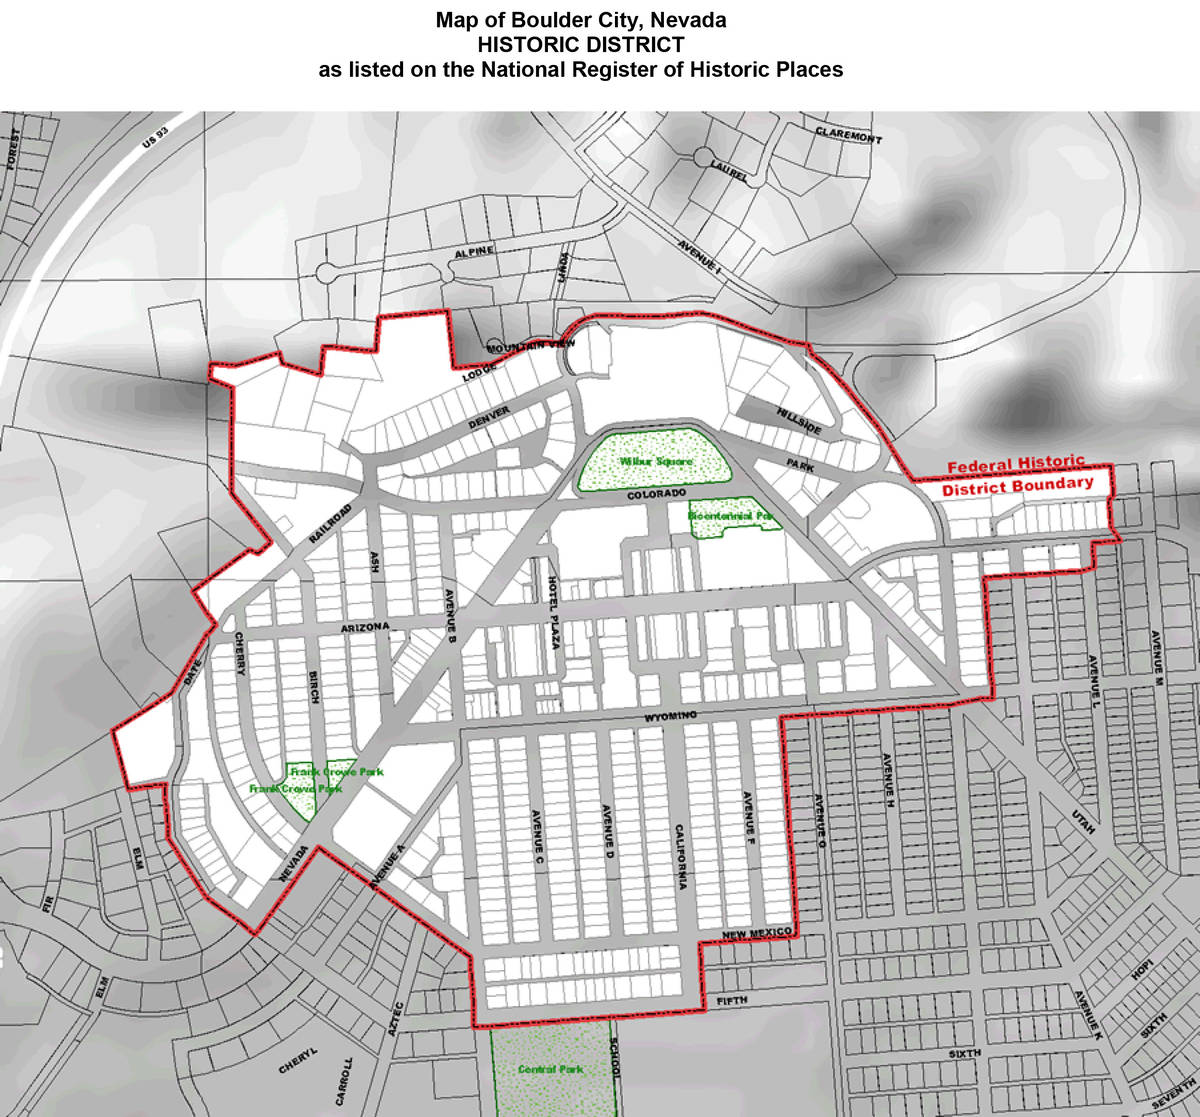 14210424_web1_BCR-Historic-District-Map-MAR09-17.jpg